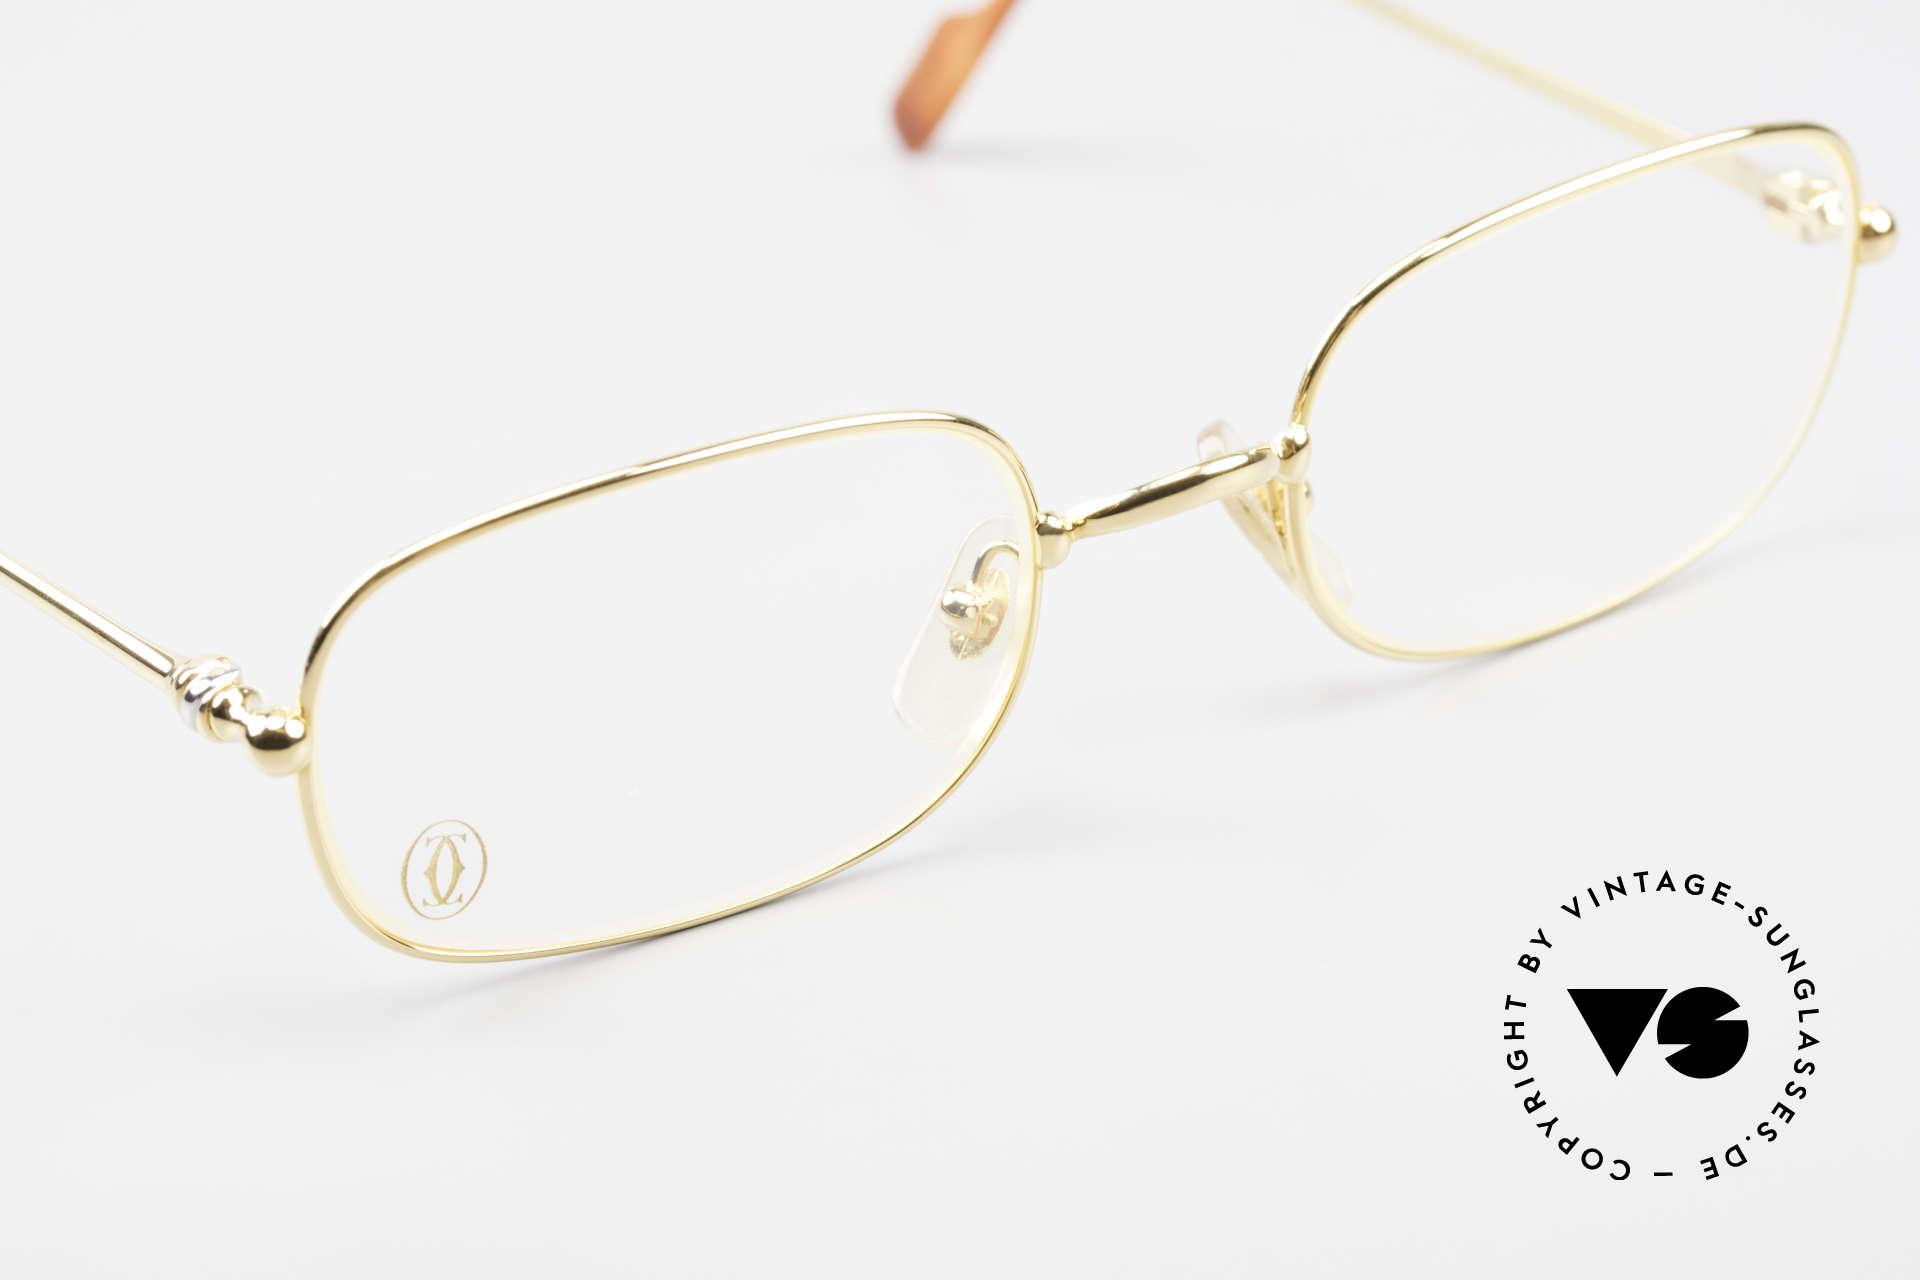 Cartier Deimios Rare Luxury Eyeglasses 90's, unworn rarity incl. orig. Cartier packing (case, cloth), Made for Men and Women